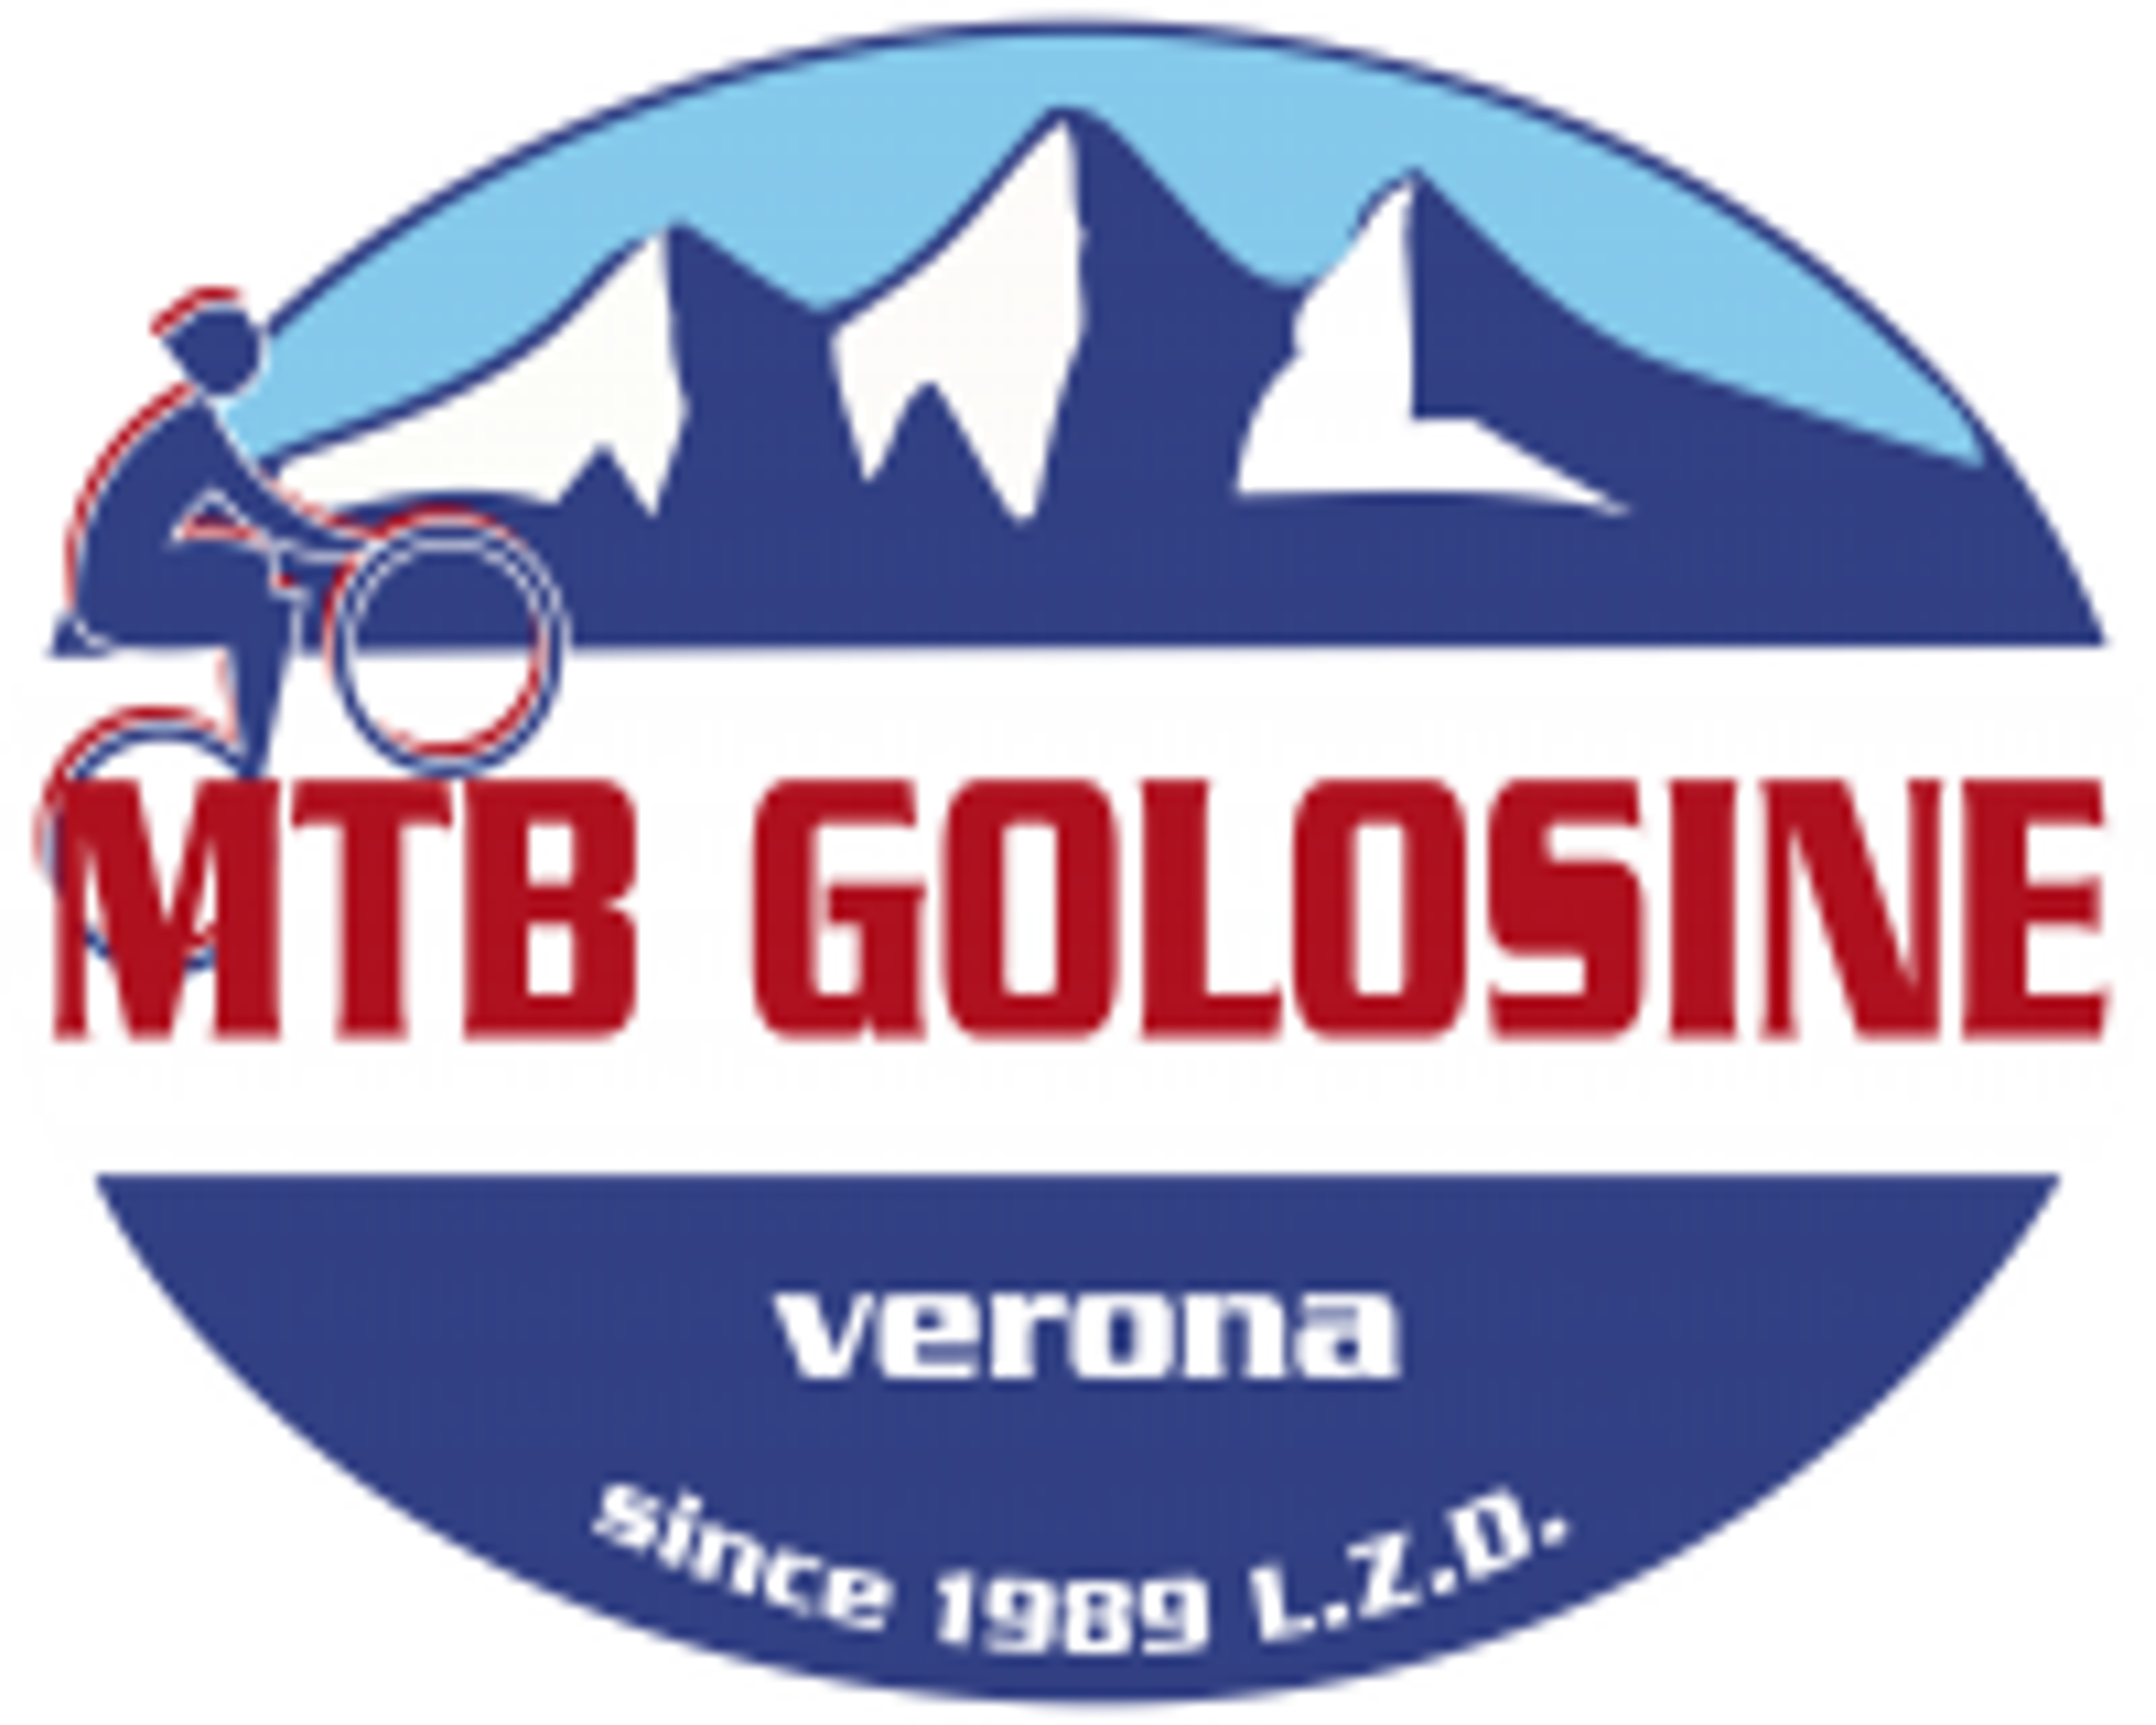 MTB Golosine